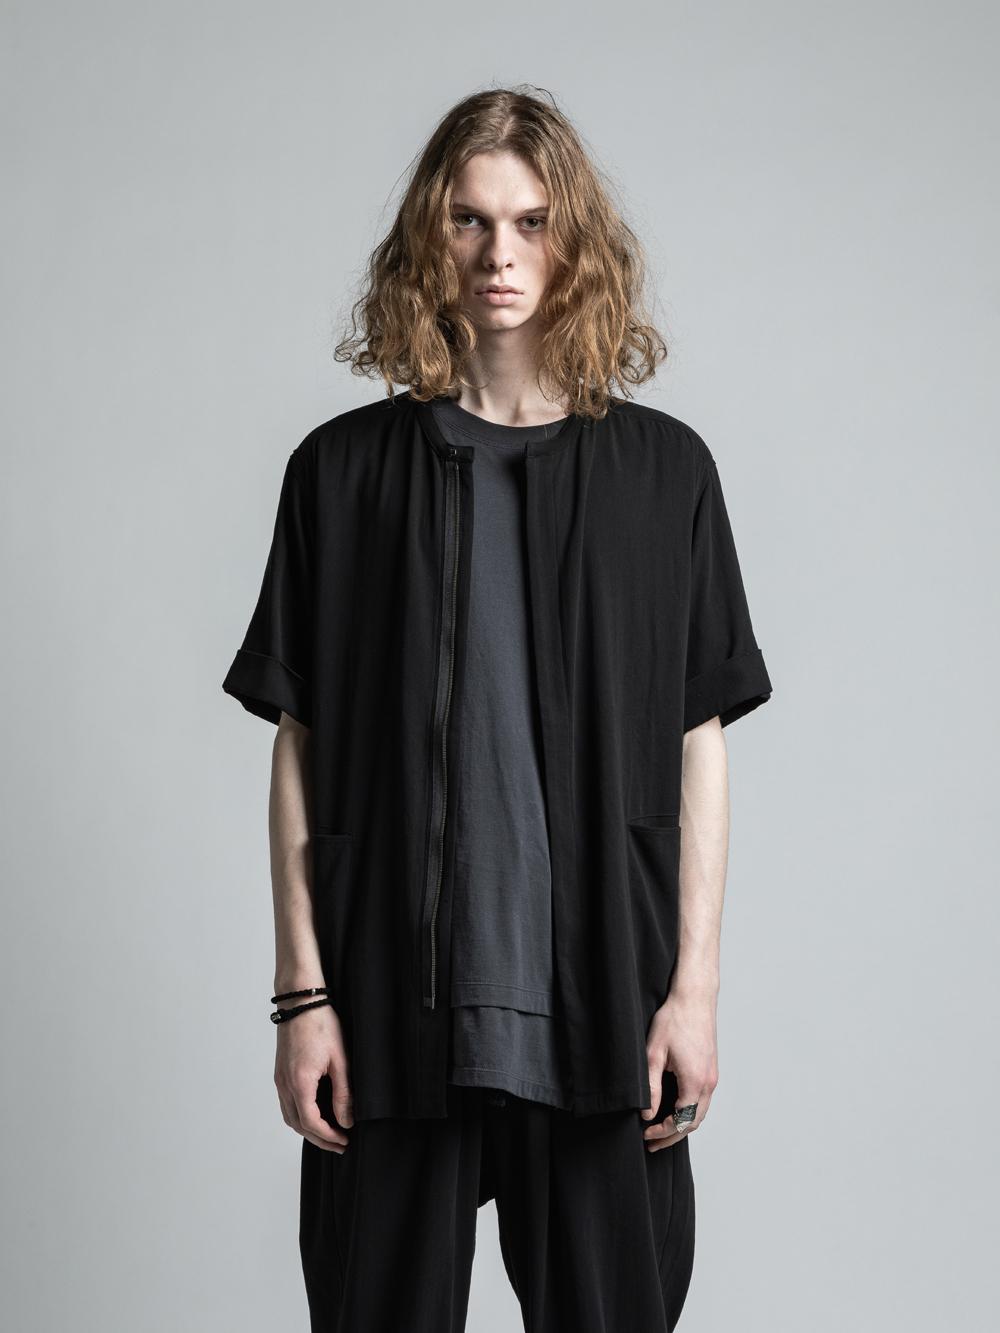 VI-3200-02 / 強撚二重織りコットン半袖シャツ